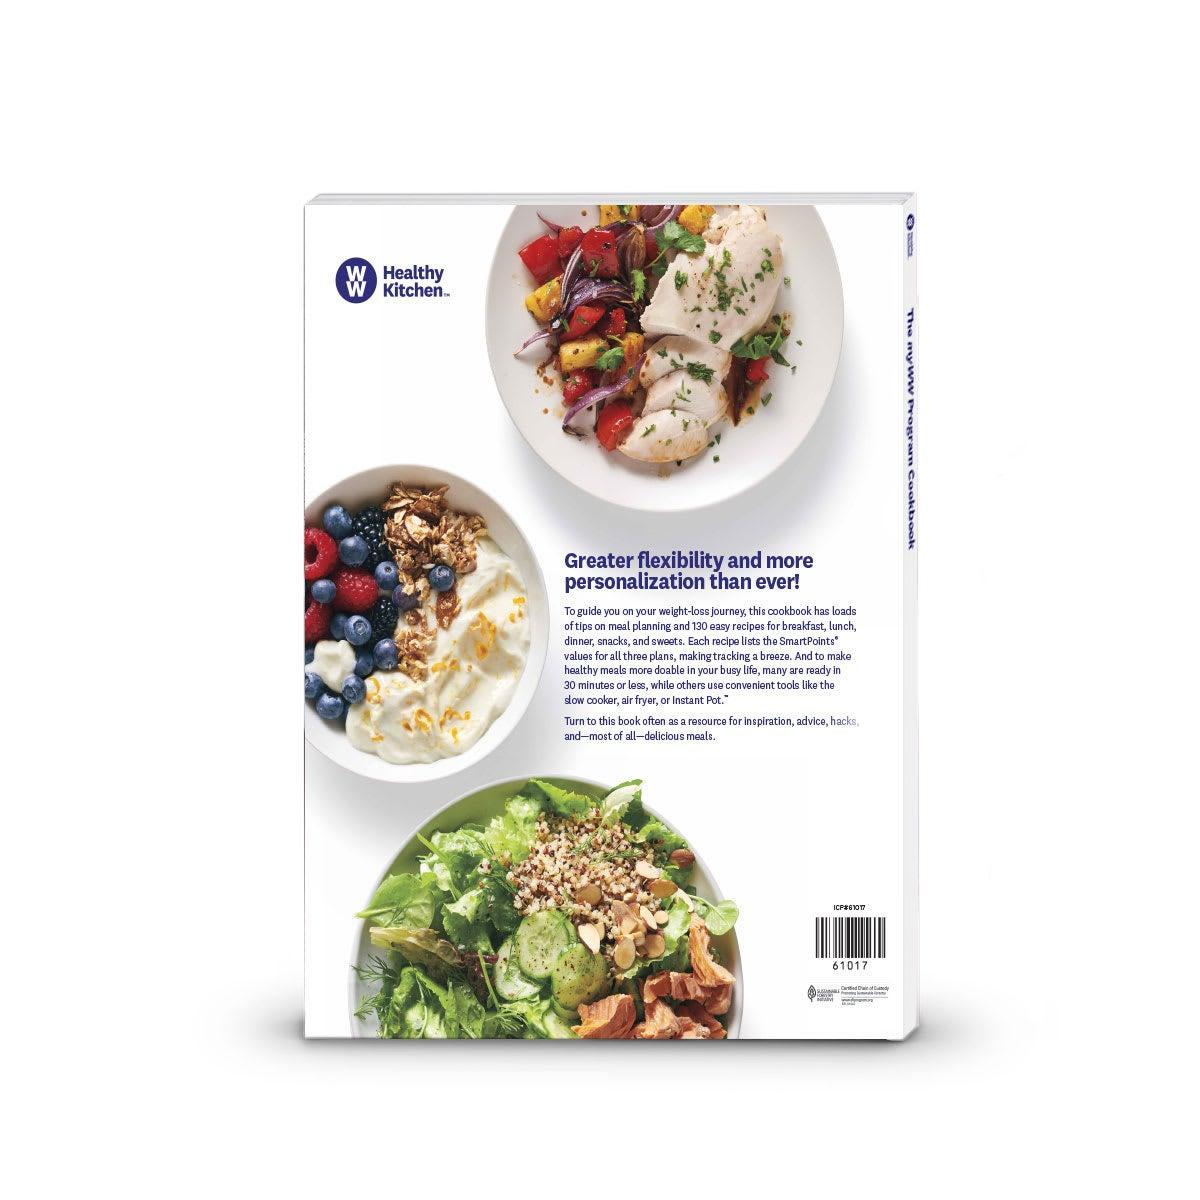 The myWW Program Cookbook - alternate view